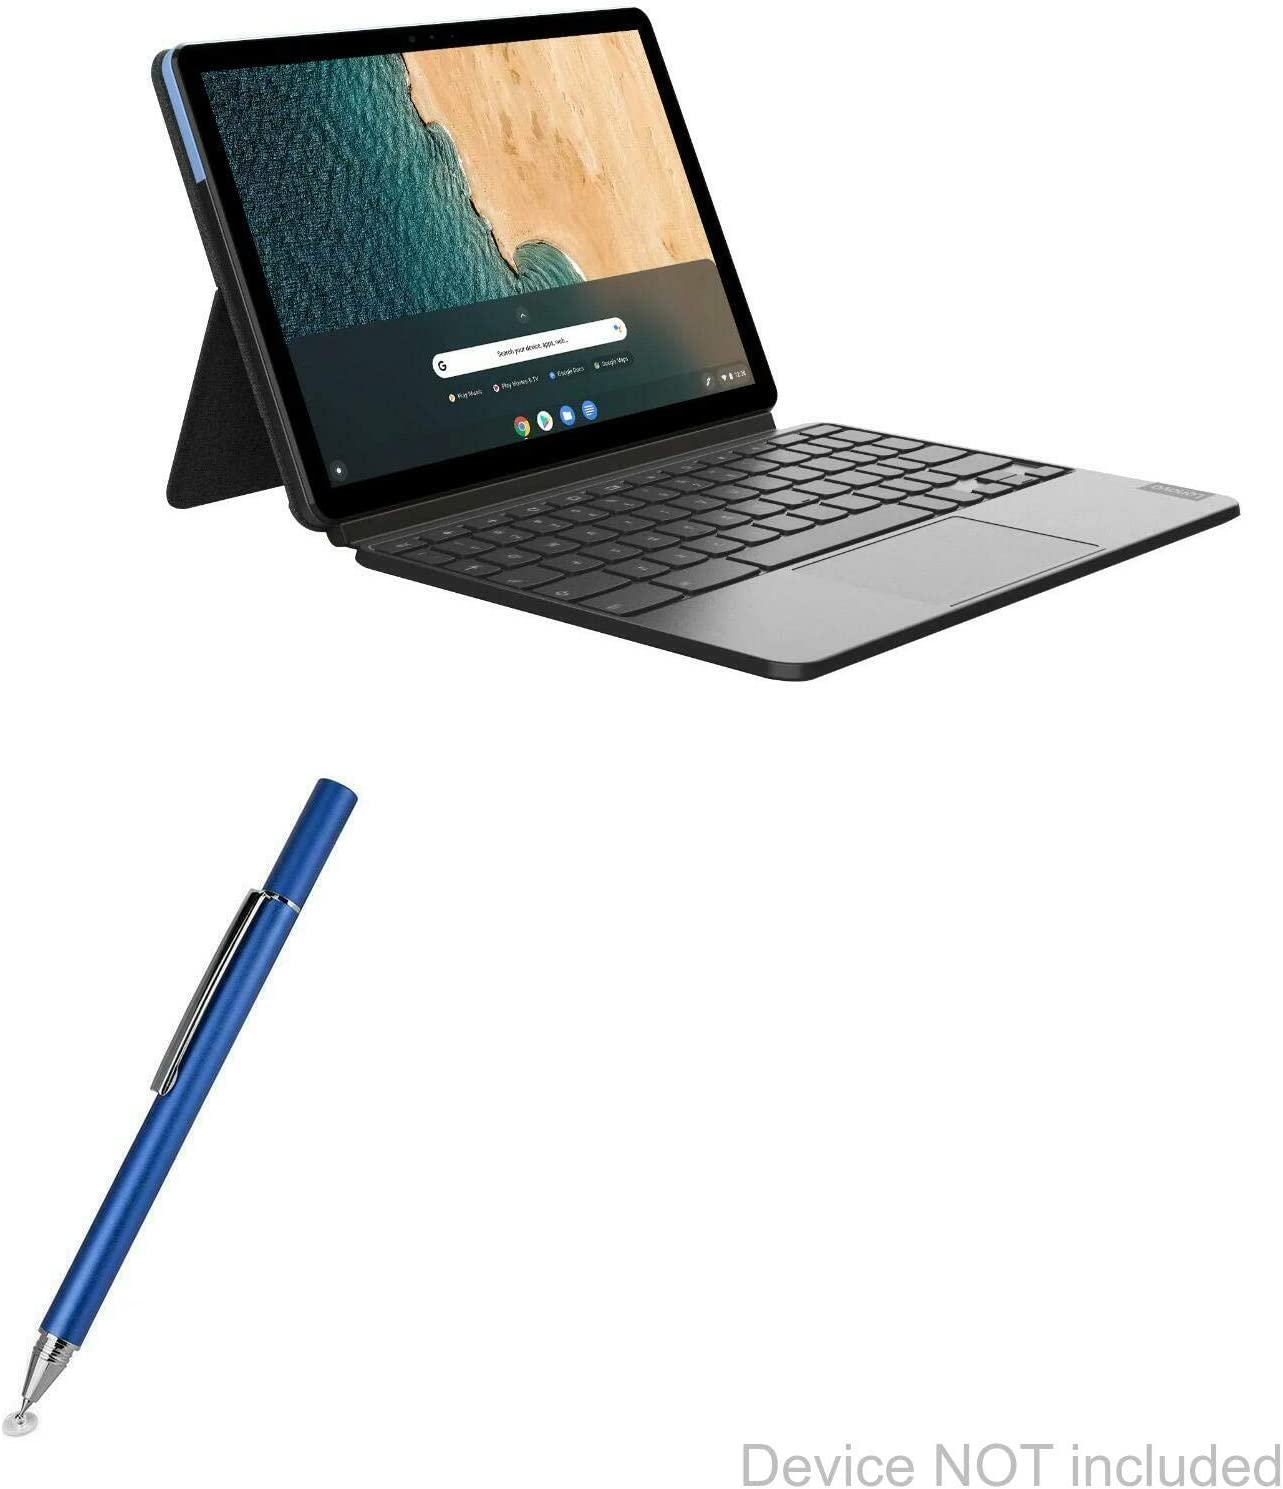 Lenovo Chromebook Duet Stylus Pen, BoxWave [FineTouch Capacitive Stylus] Super Precise Stylus Pen for Lenovo Chromebook Duet - Lunar Blue